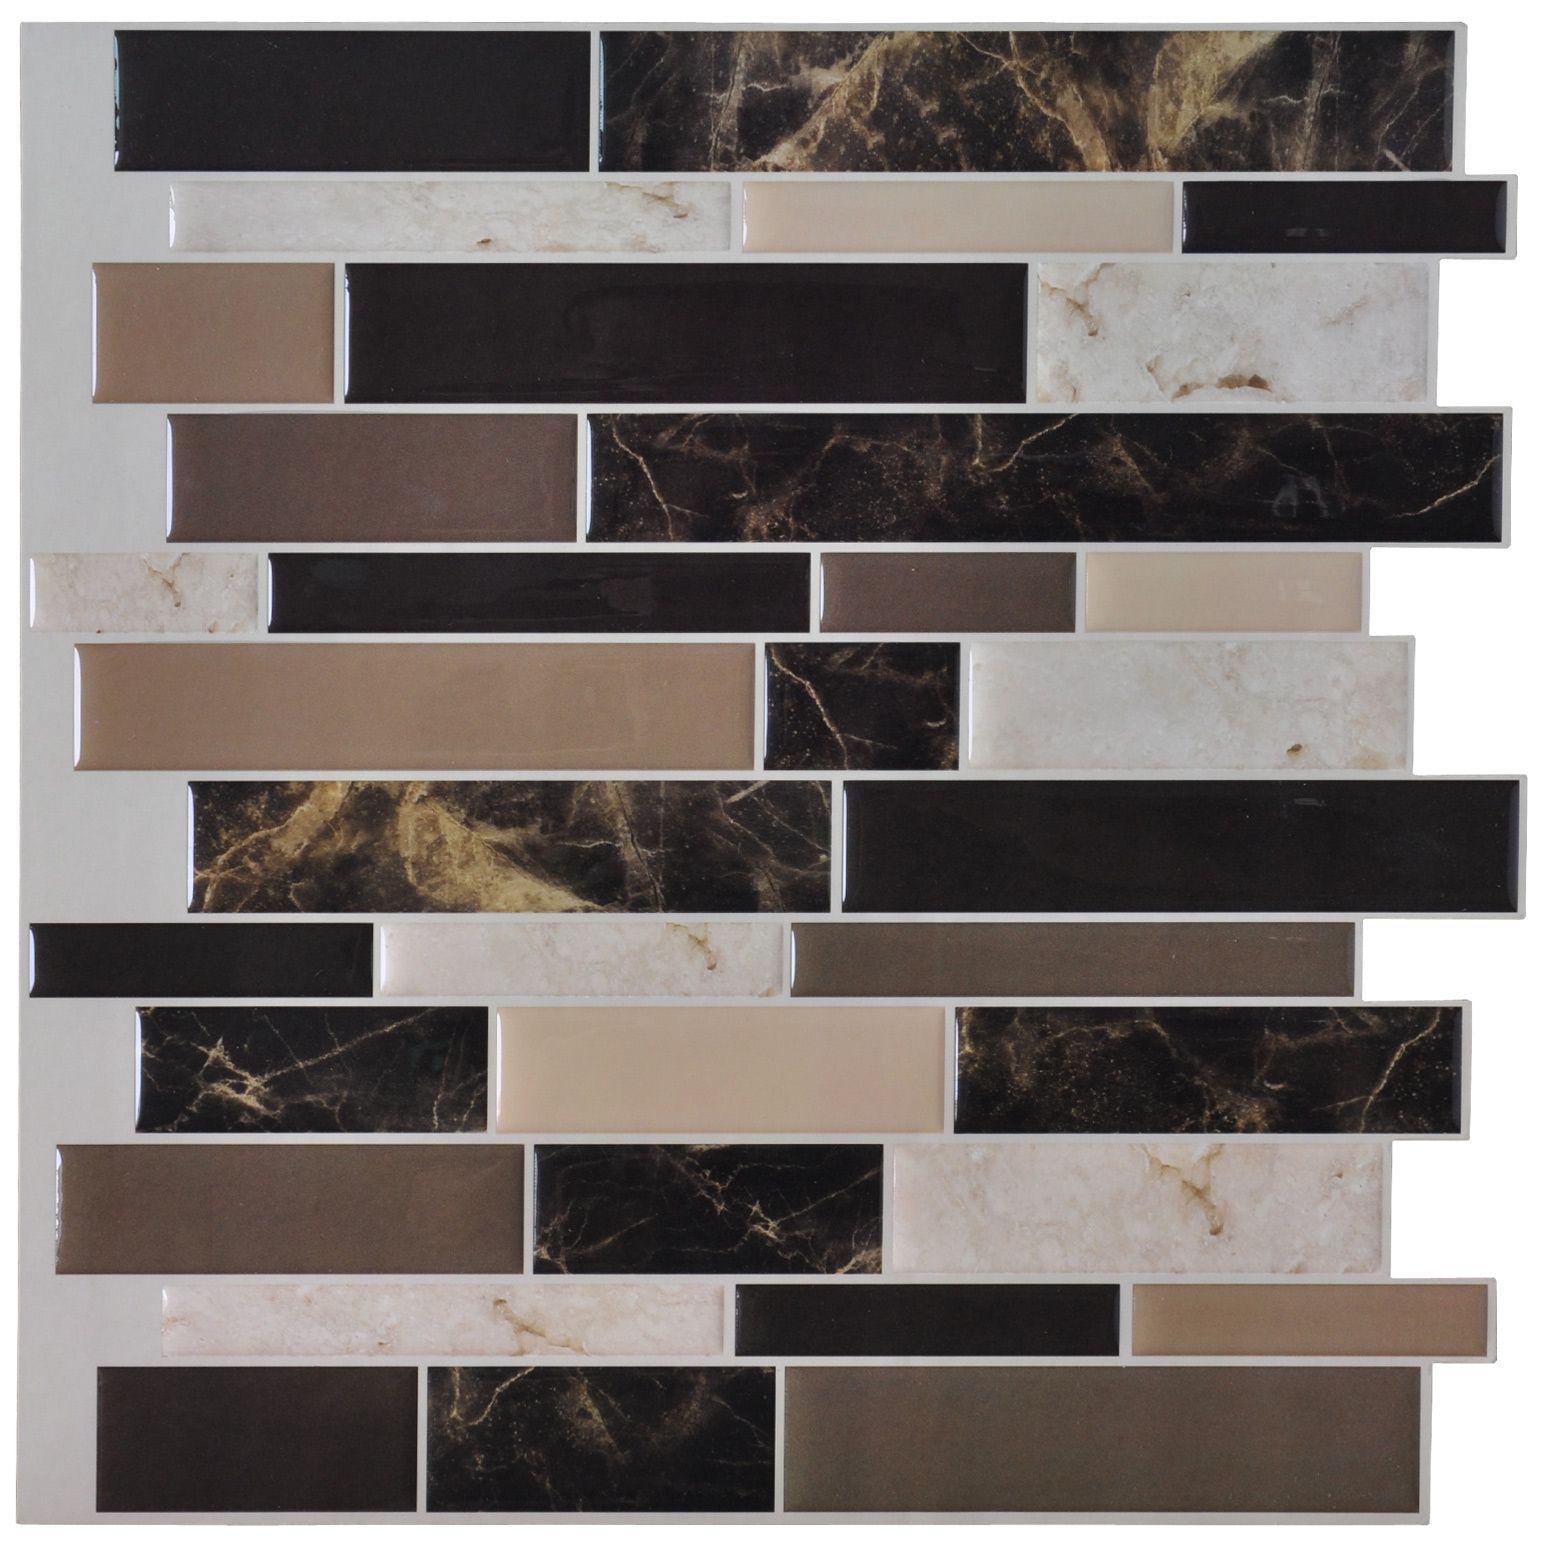 A Self Adhesive Backsplash Tiles for Kitchen 10 Pieces